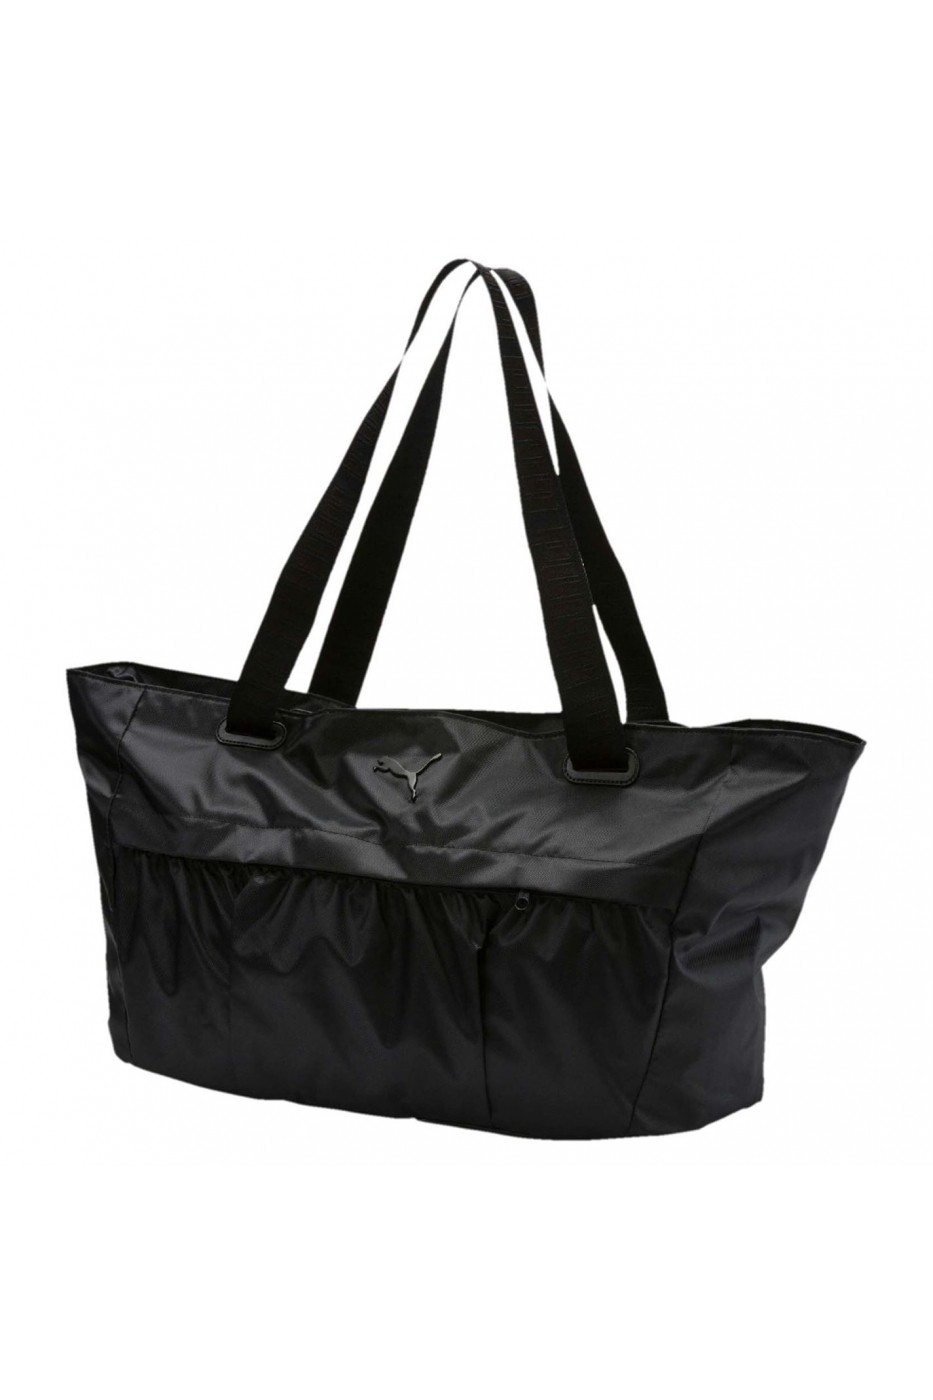 Puma Sportos táska ARC-70722603 Fekete - FashionUP! 4ee29ce994